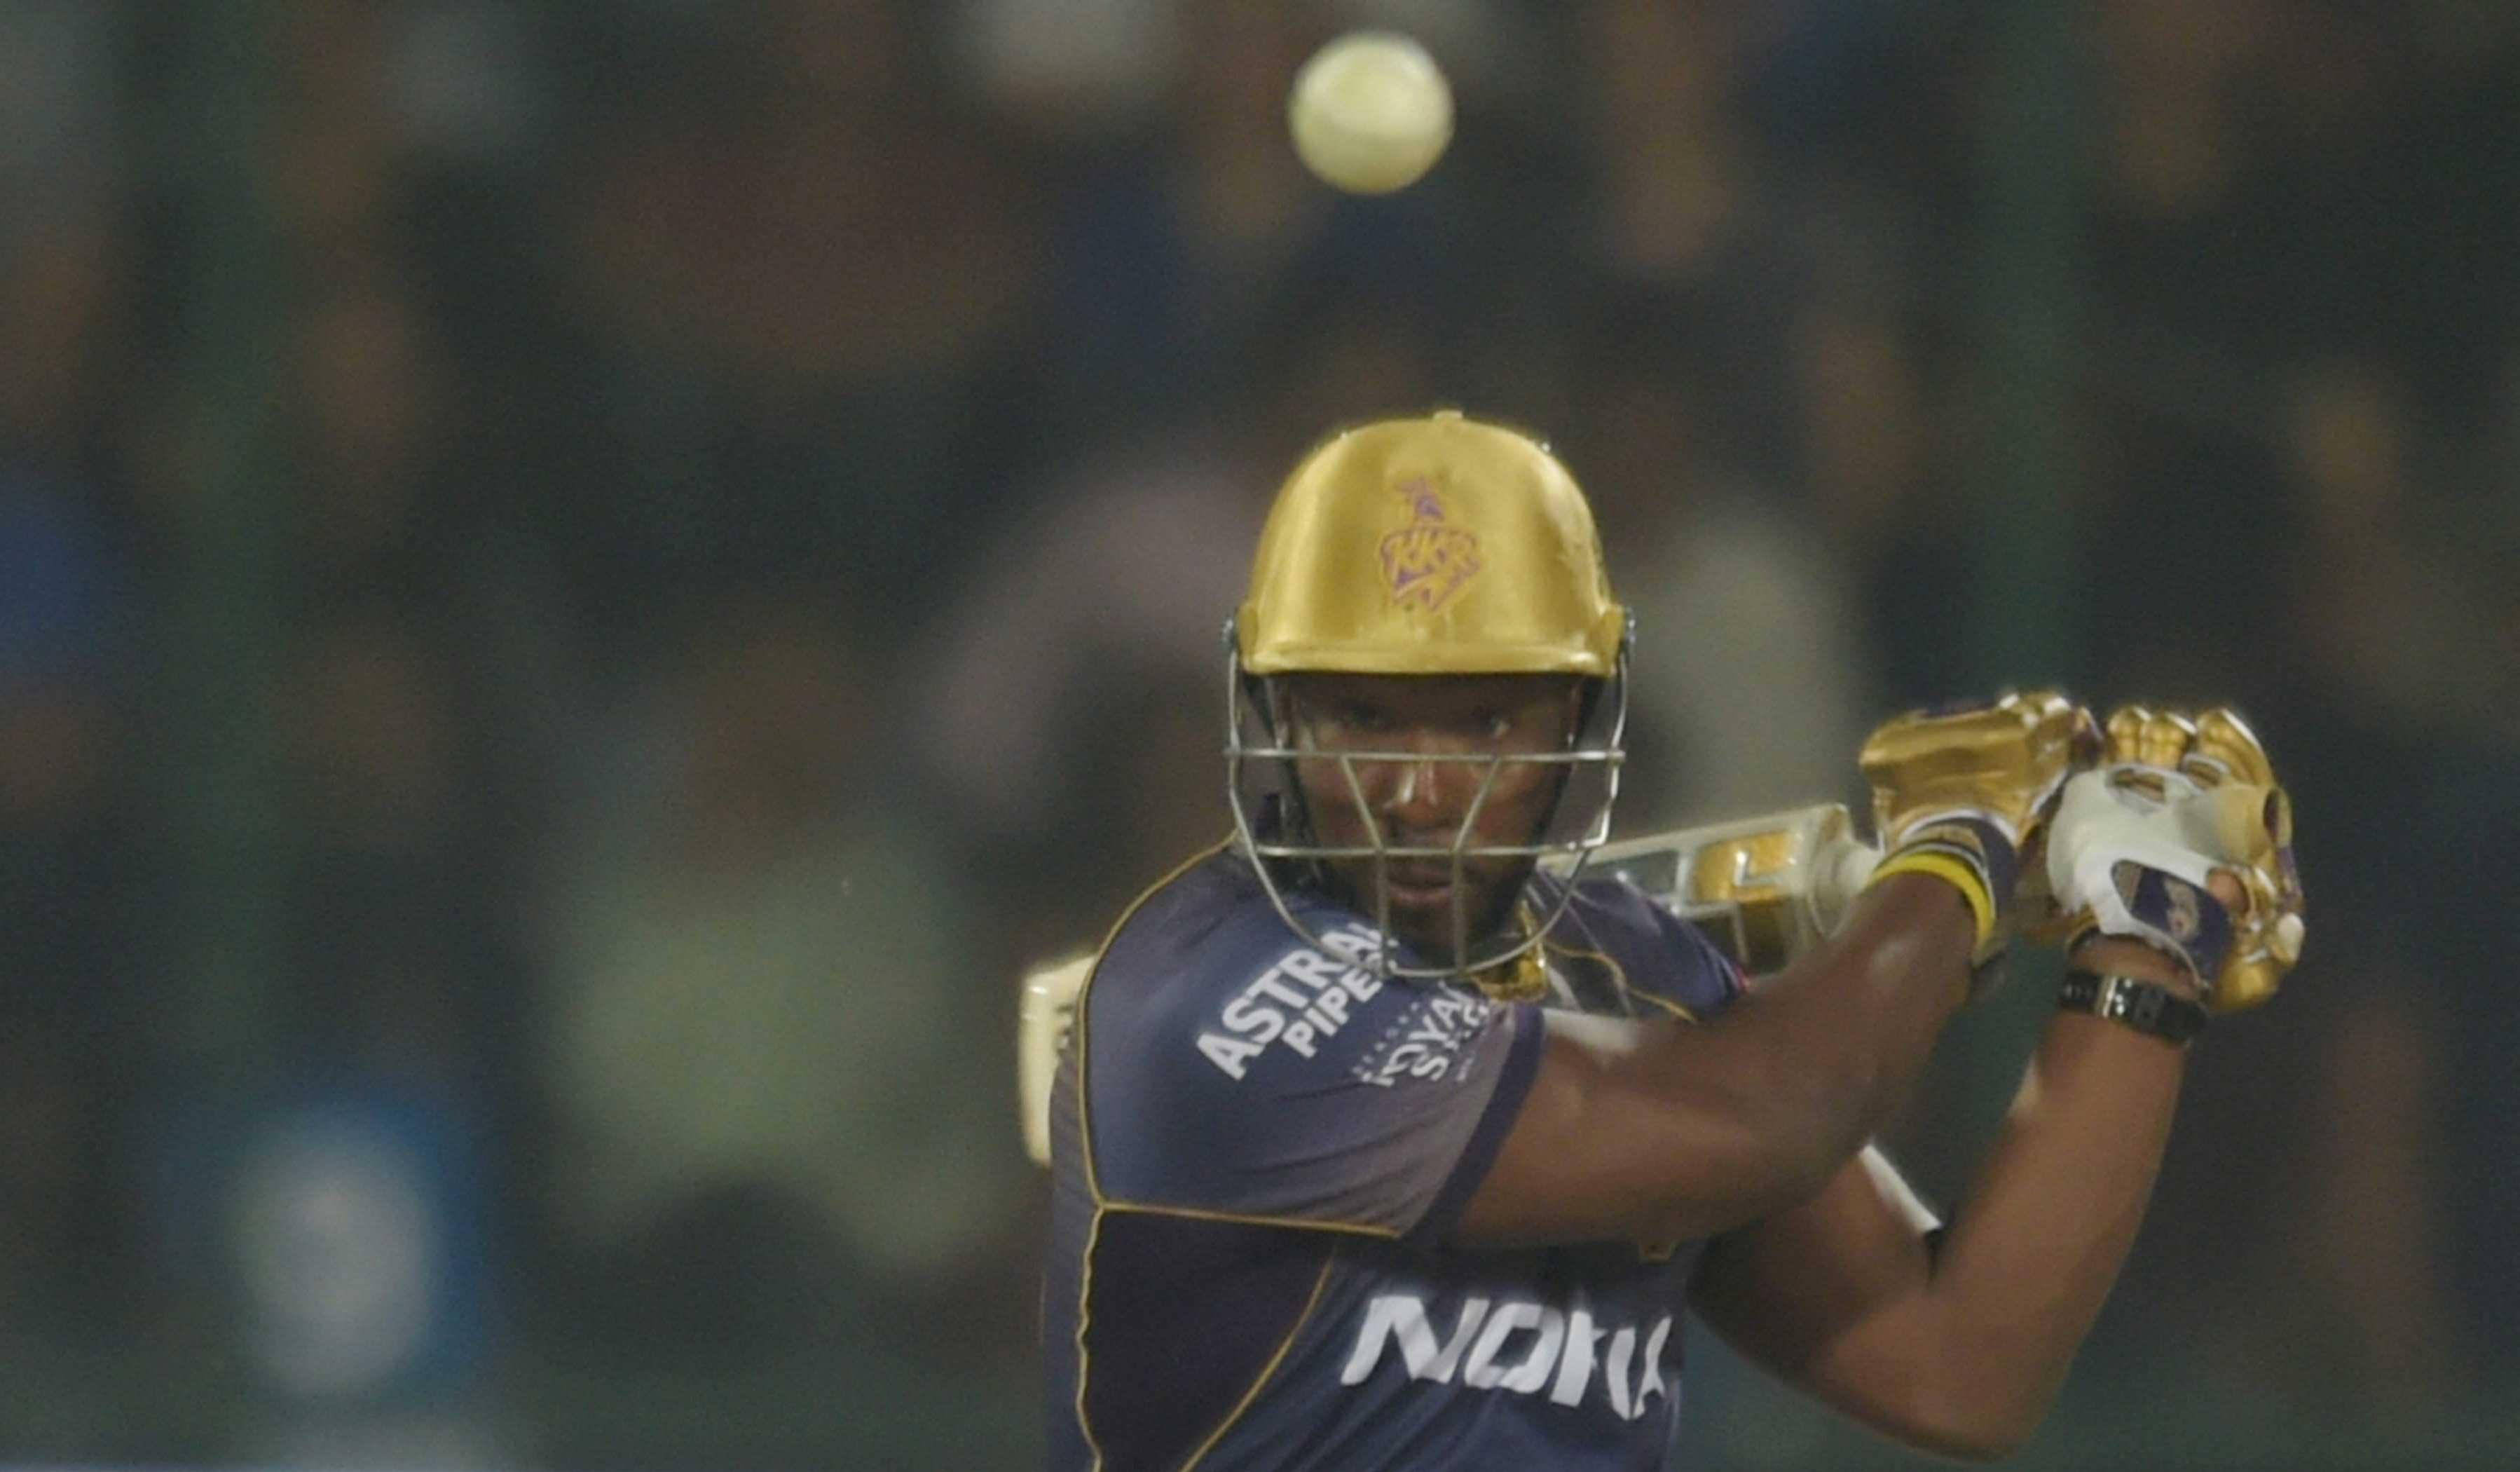 Andre Russell plays a shot during the IPL cricket match between Delhi Capitals and Kolkata Knight Riders at Feroz Shah Kotla Stadium, New Delhi, on March 30, 2018.